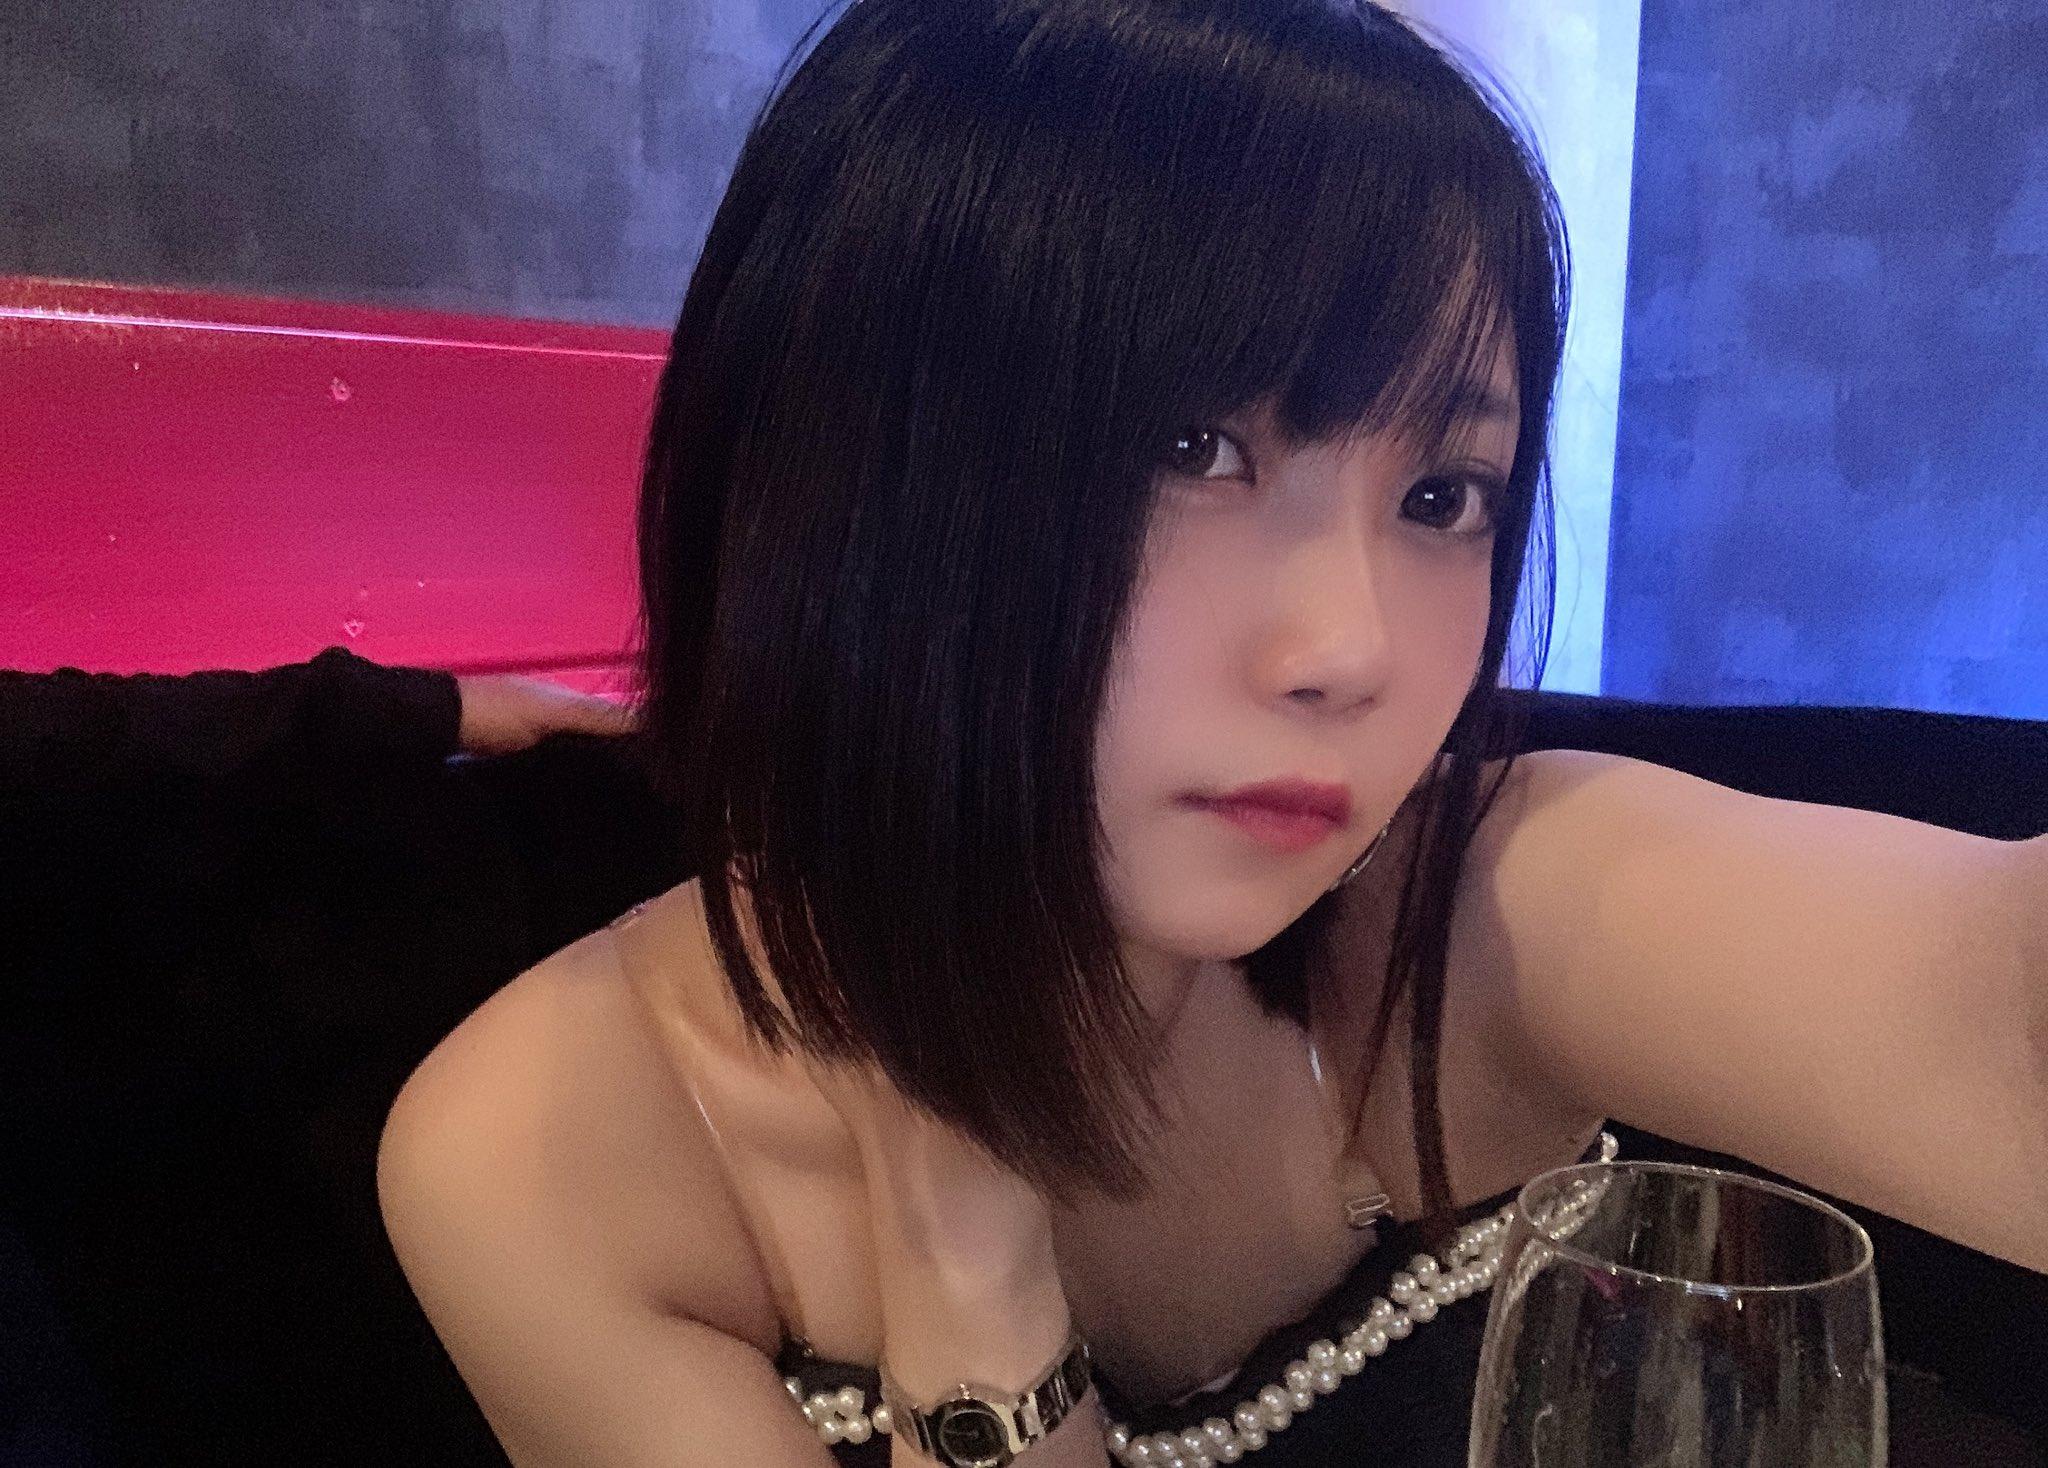 FC2หนังอันเซนจากสาวเอวีสุดลึกลับ?  Arisu Futaba